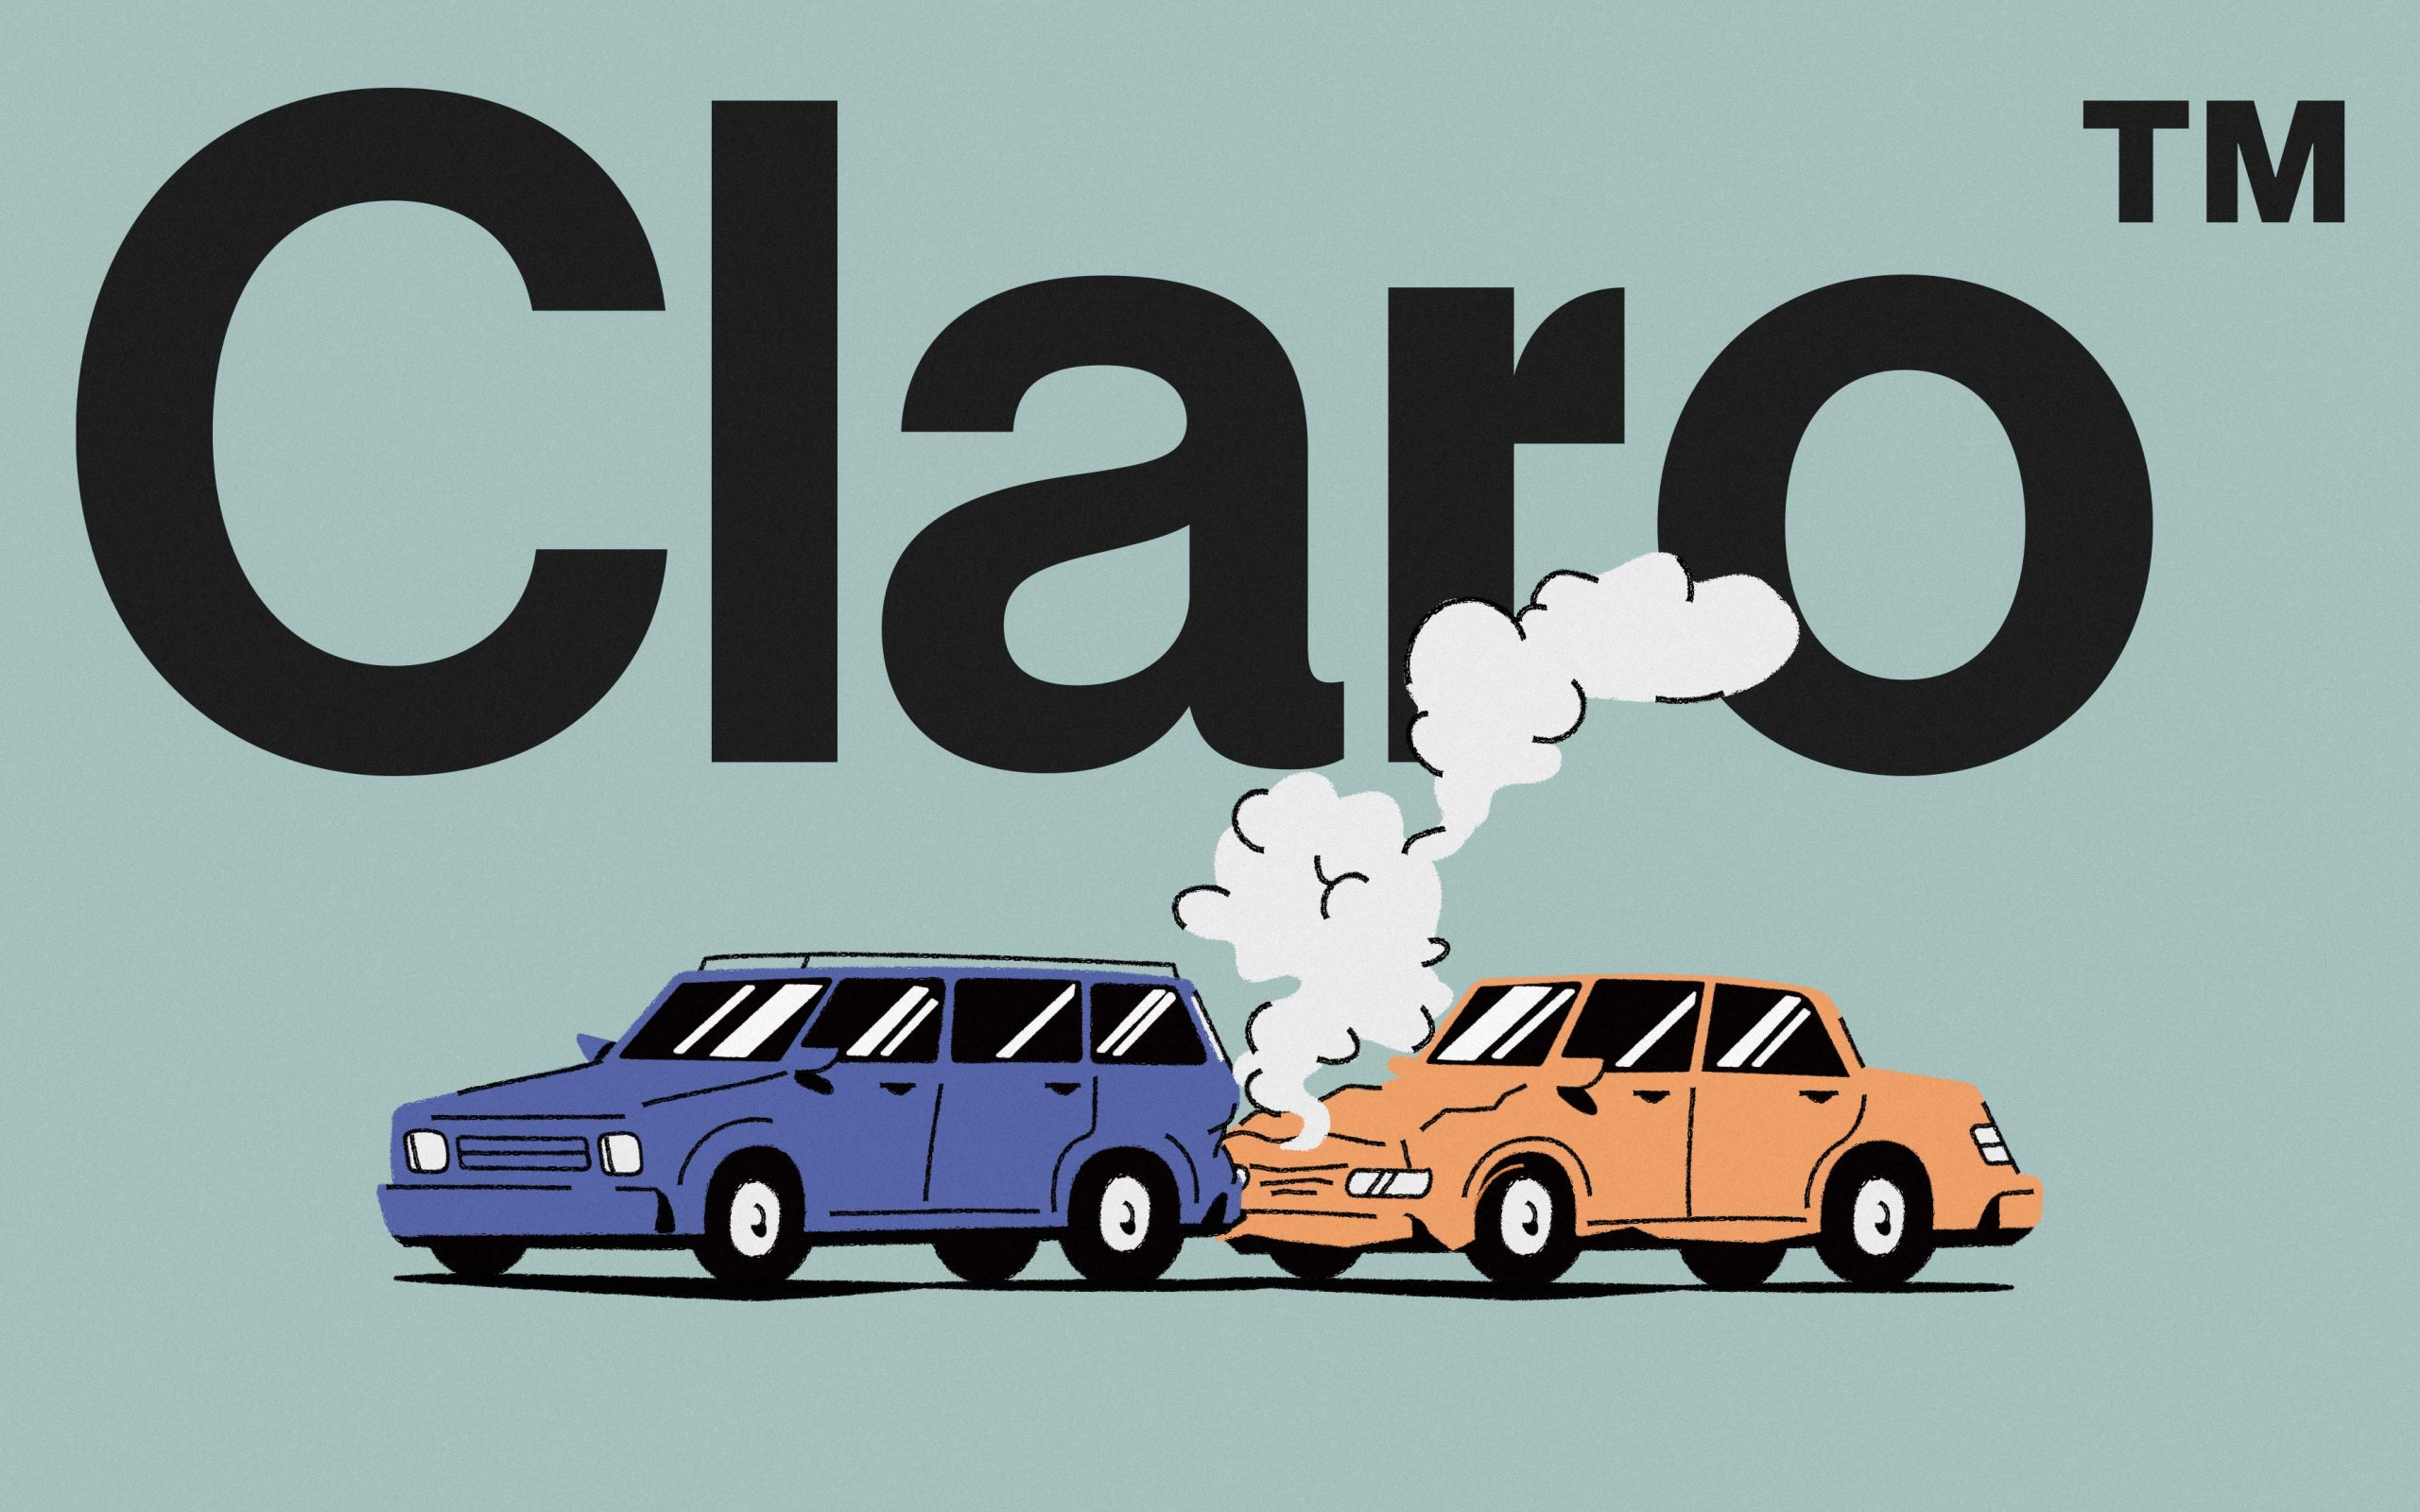 Claro-019